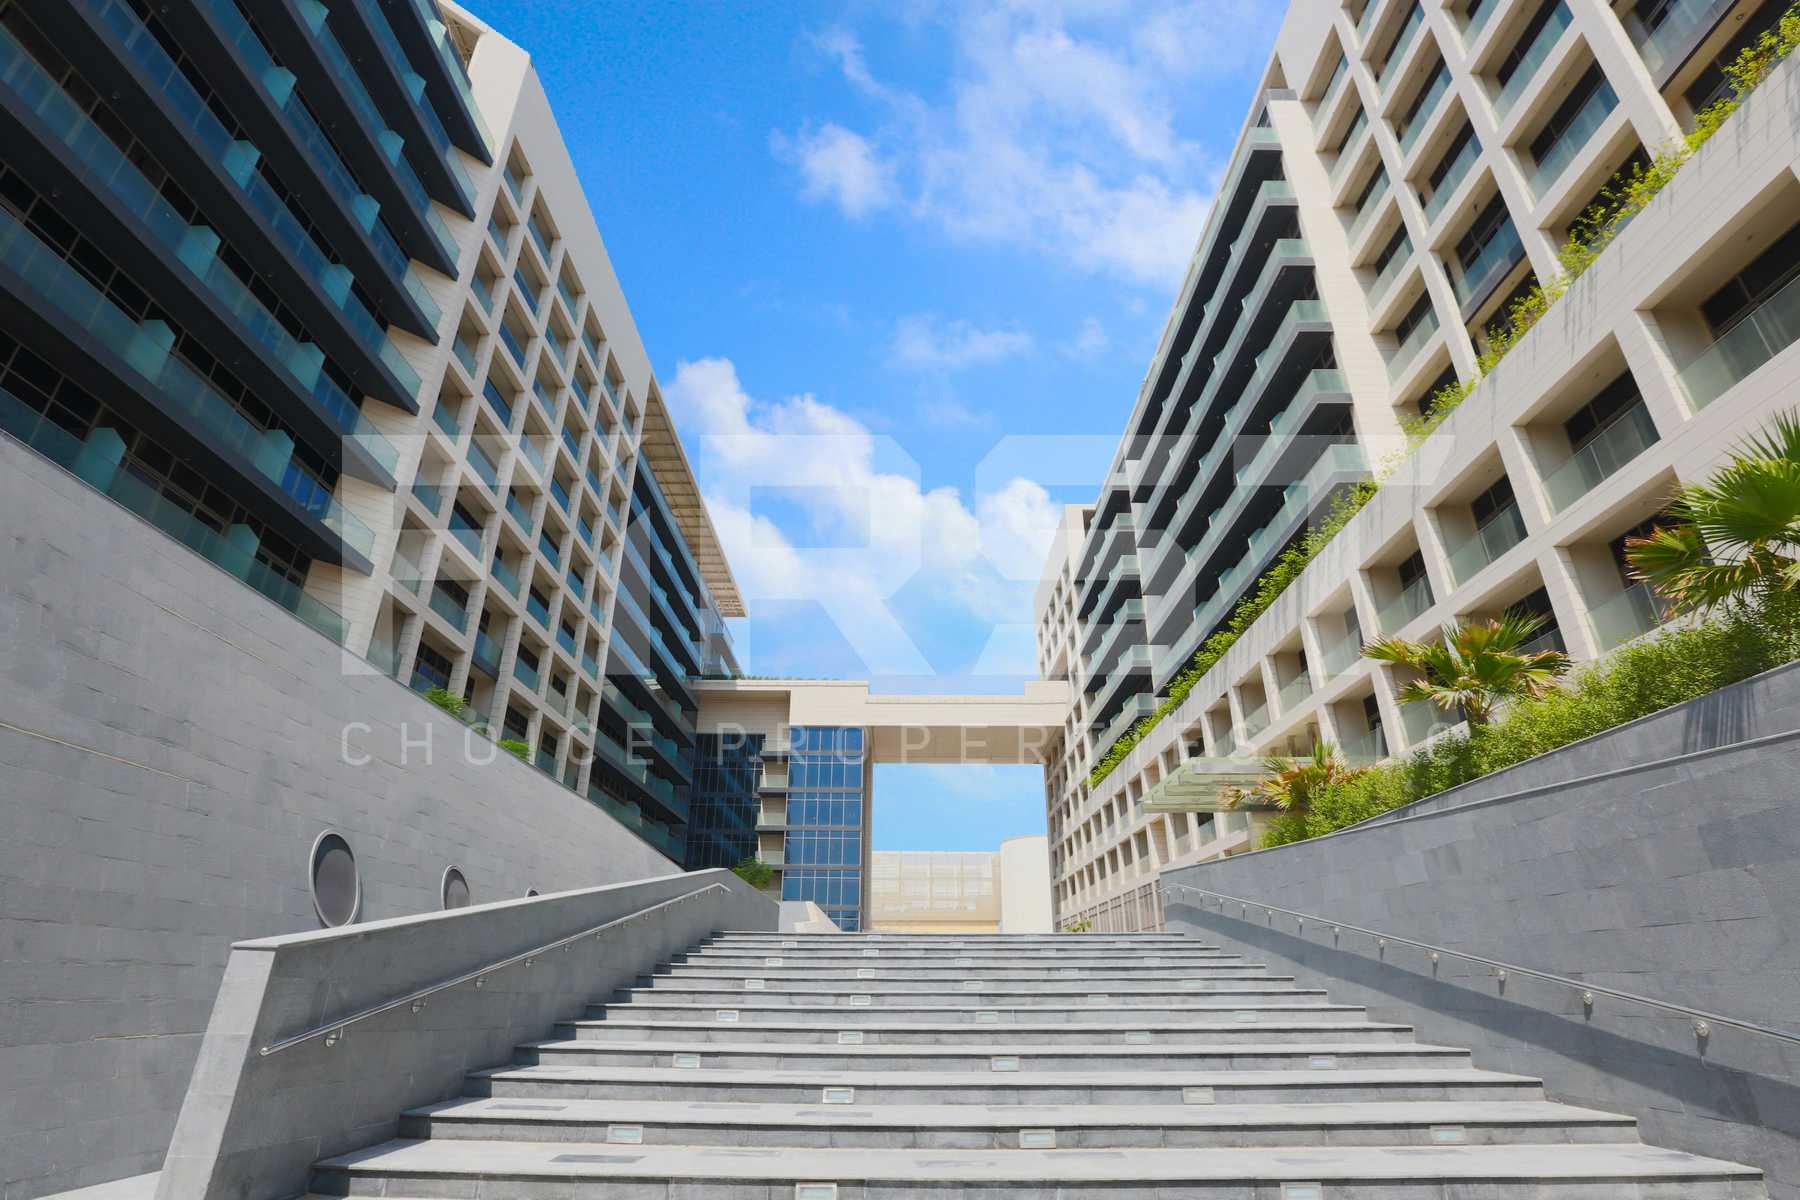 External Photo of Park View Saadiyat Island Abu Dhabi UAE (1).jpg